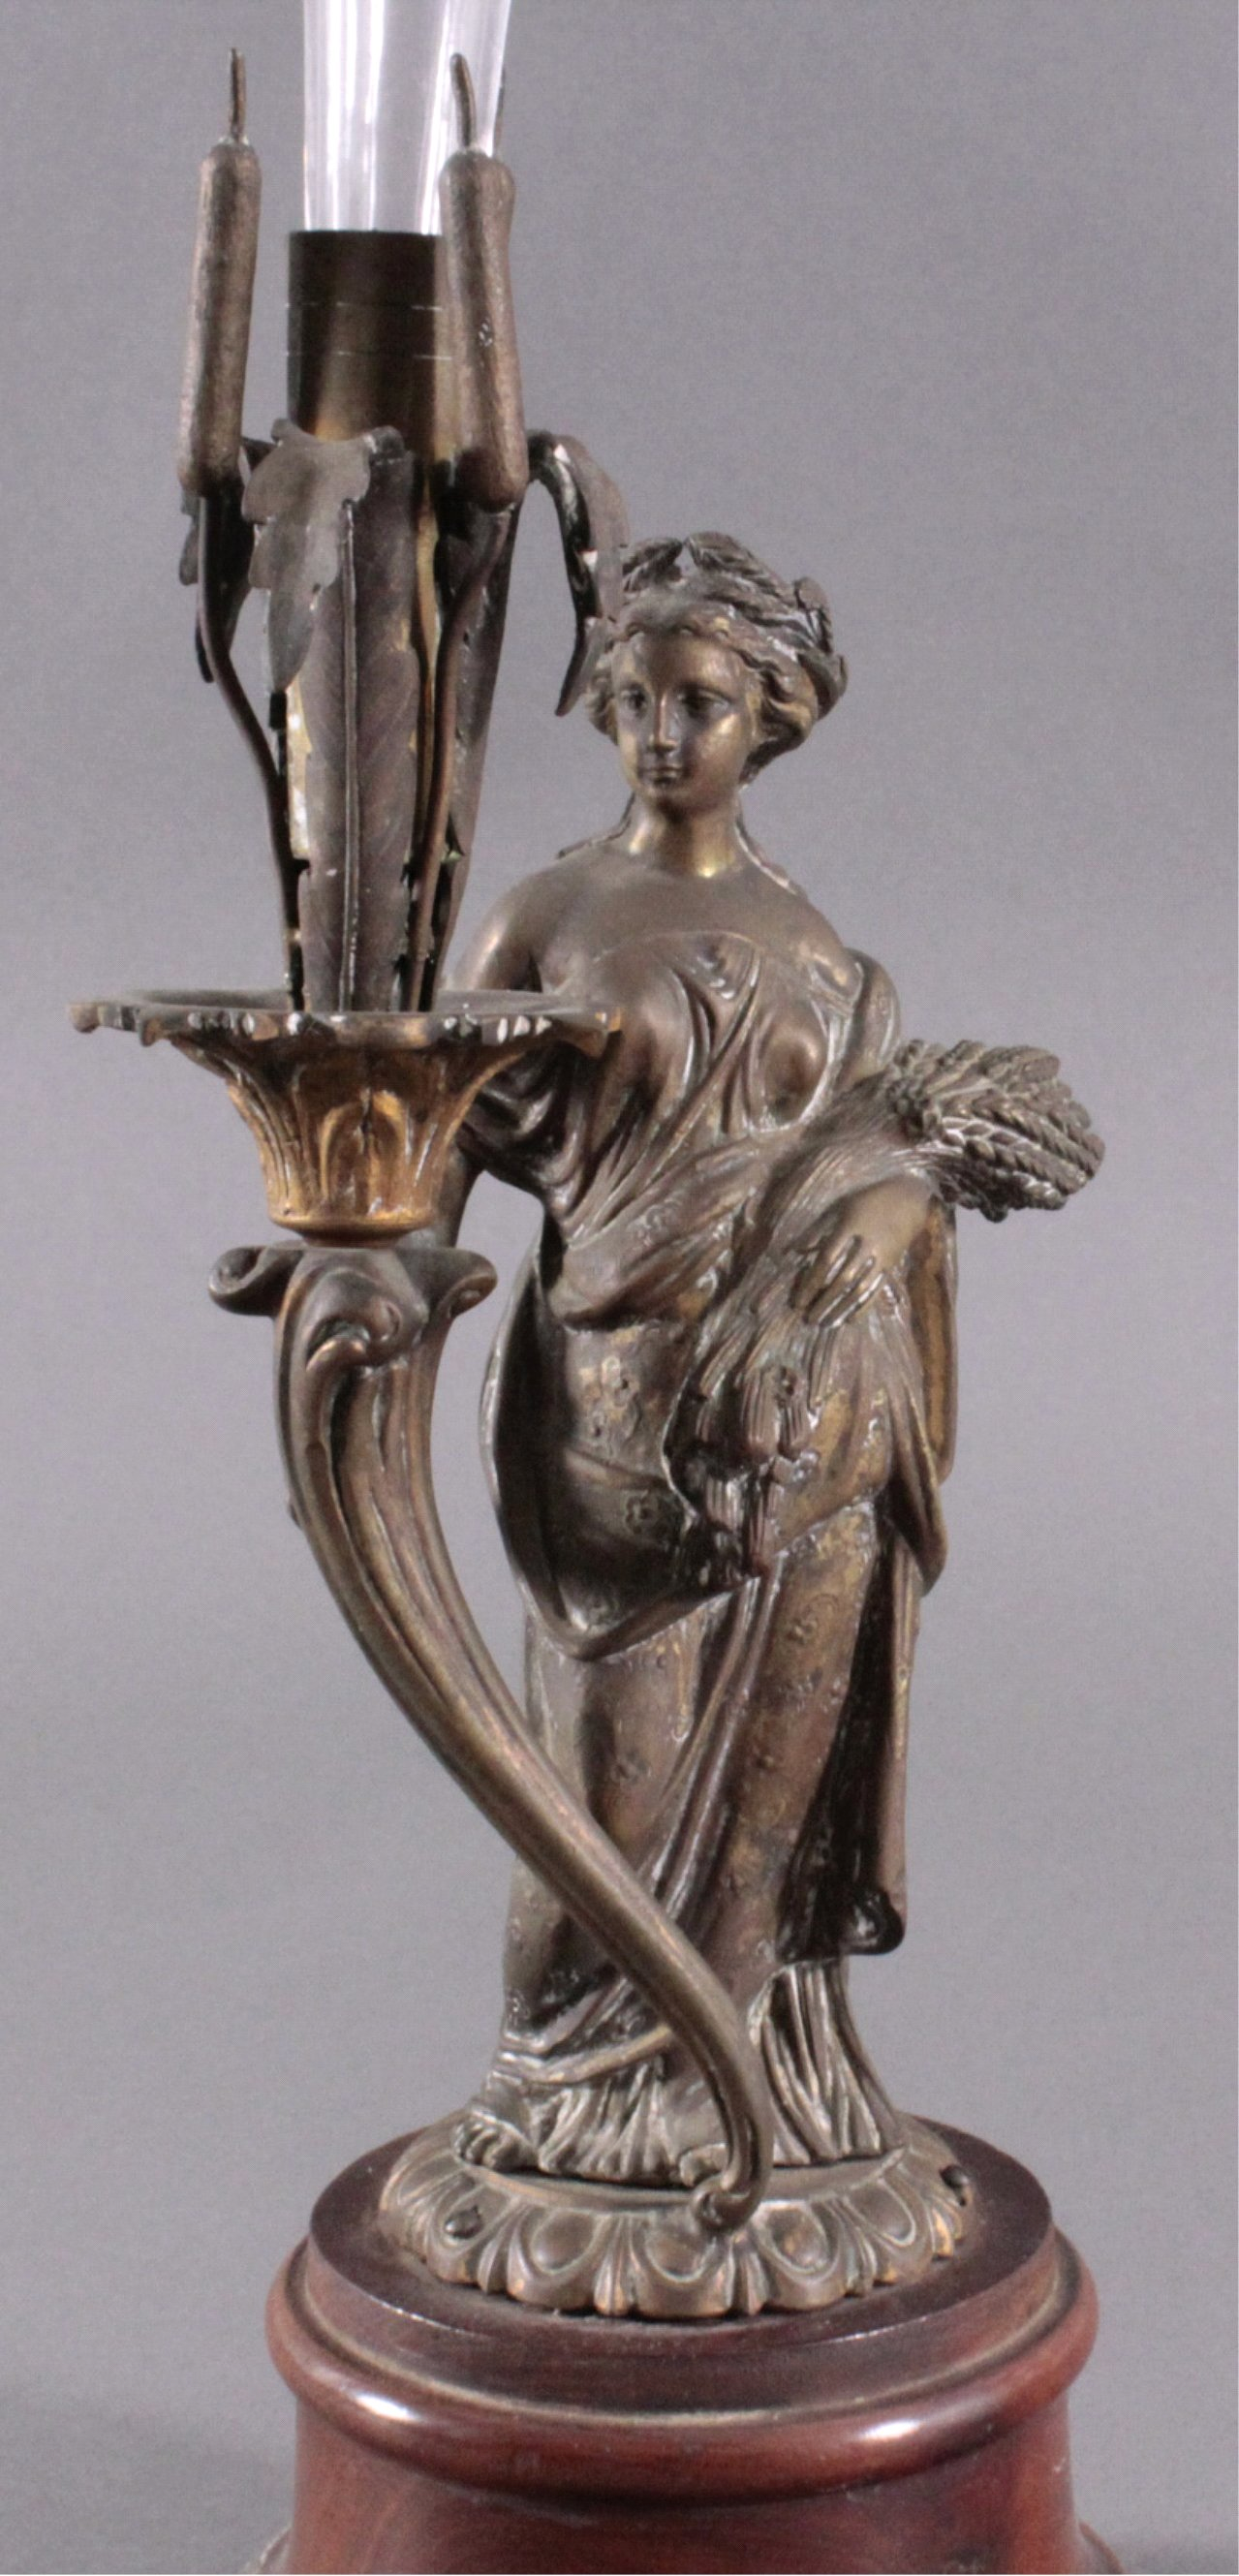 Bronze-Skulptur um 1900